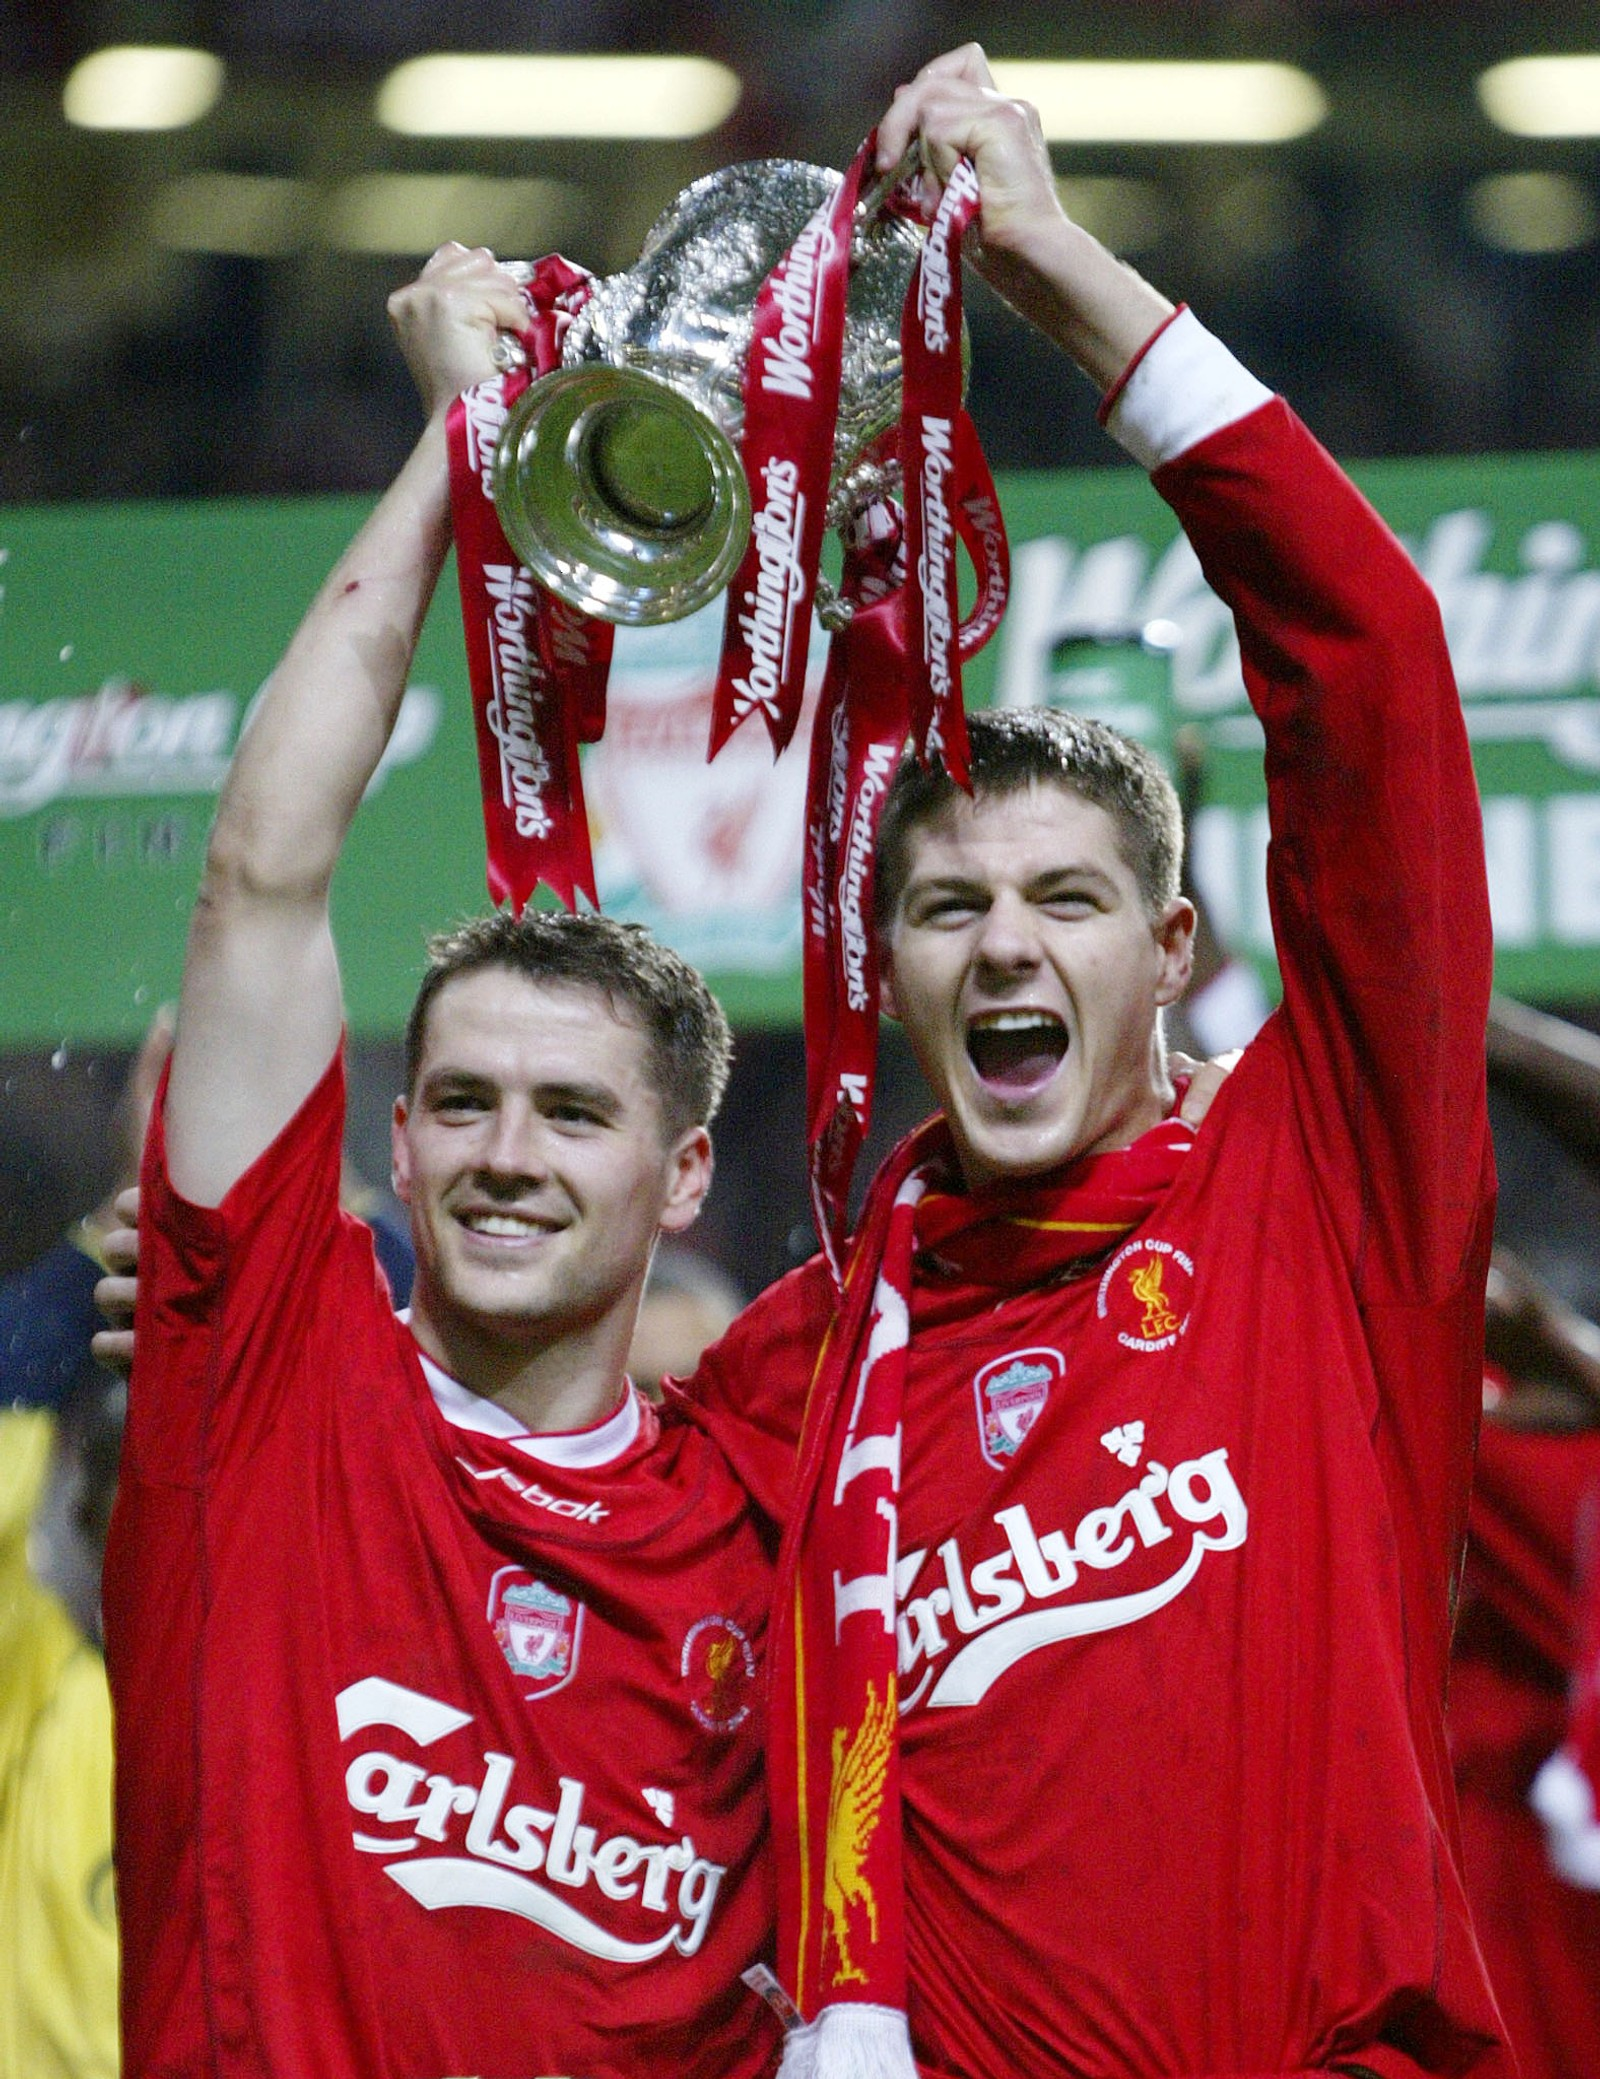 Gerrard jubler med Michael Owen etter at Liverpool vant ligacupfinalen i 2003 mot Manchester United 2-0.. De to scoret begge målene.